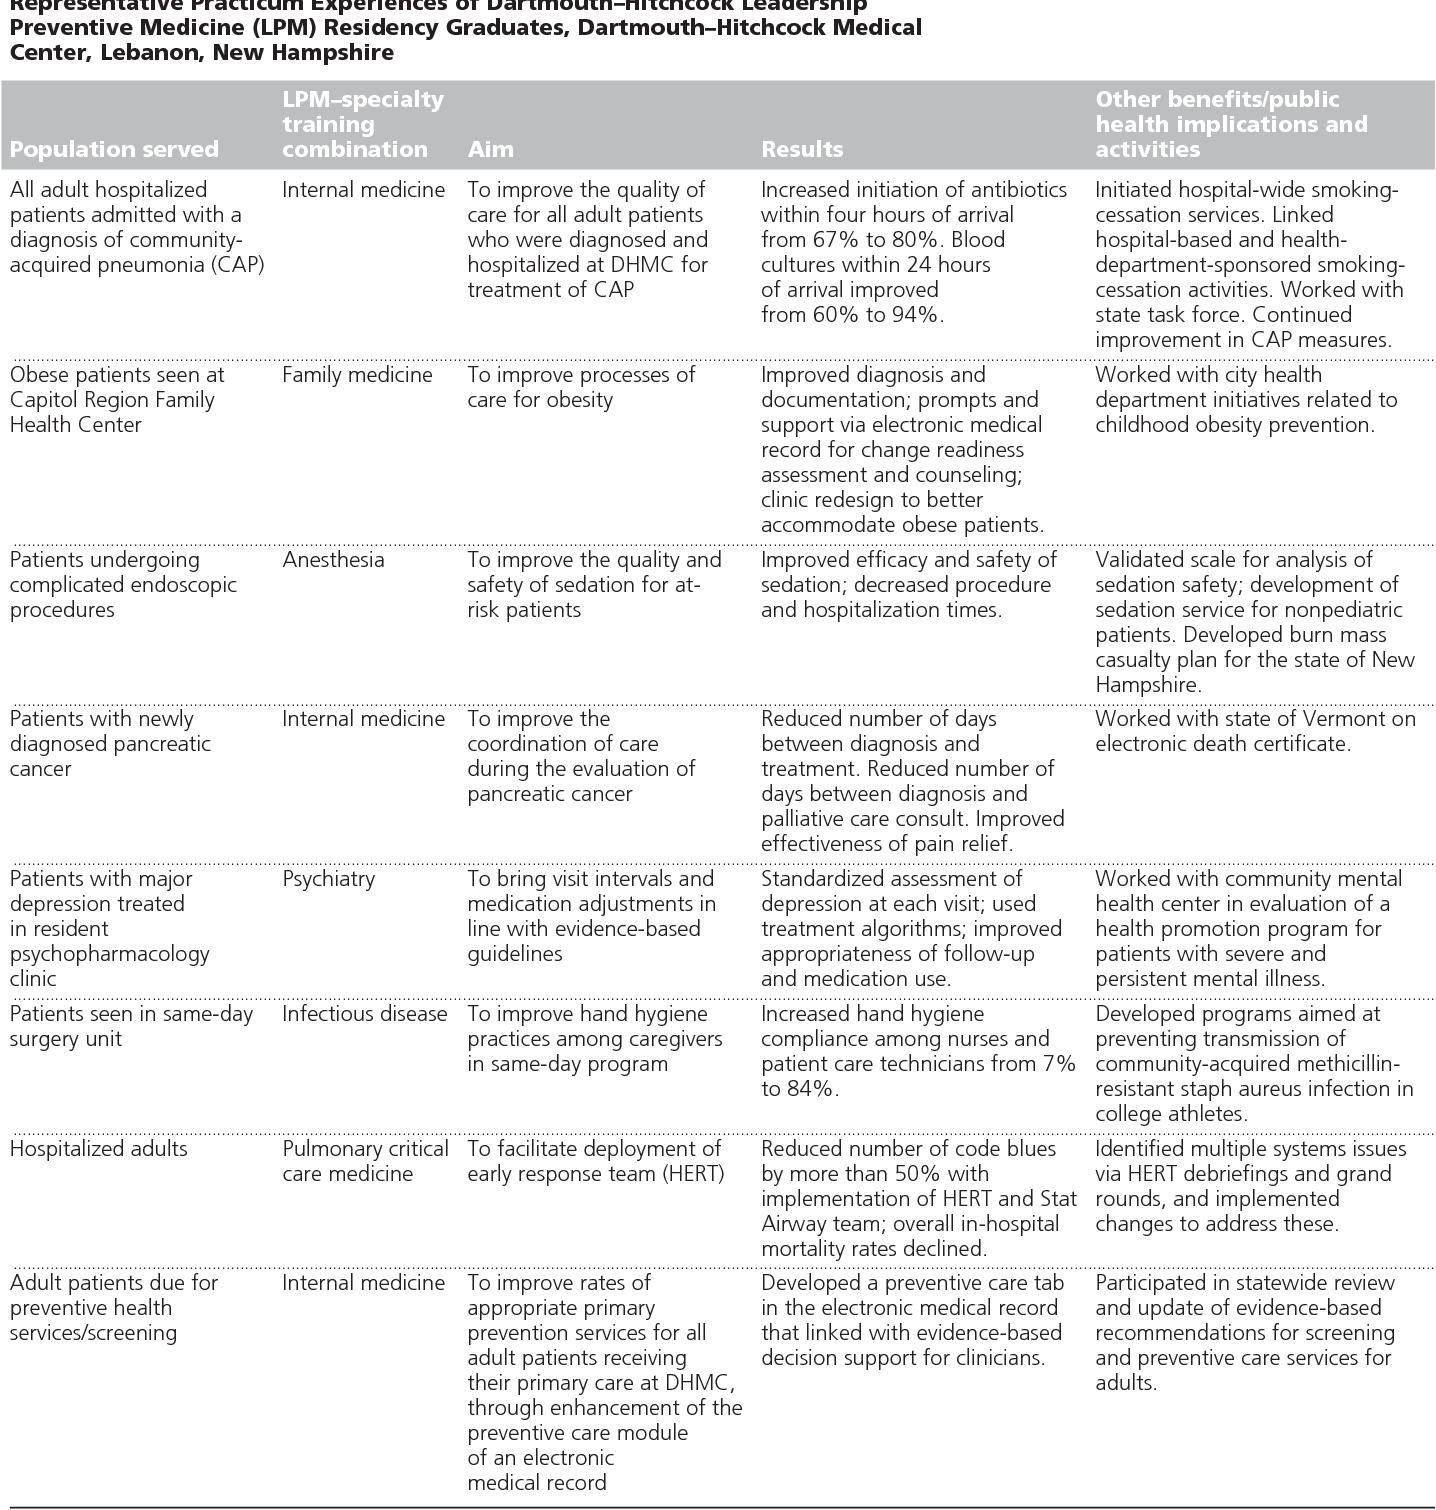 Residency education, preventive medicine, and population